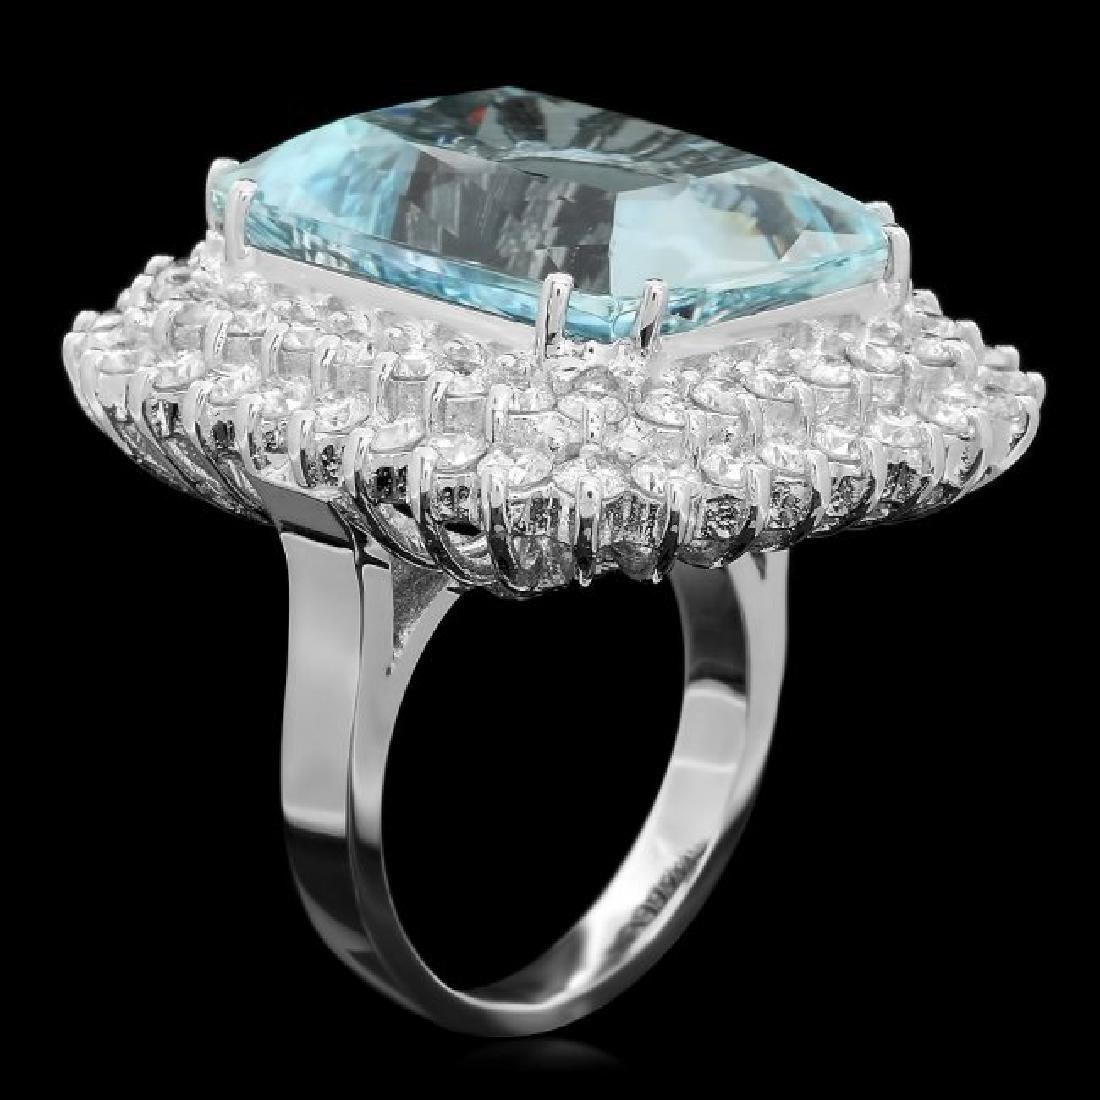 14k Gold 21.00ct Aquamarine 3.00ct Diamond Ring - 2